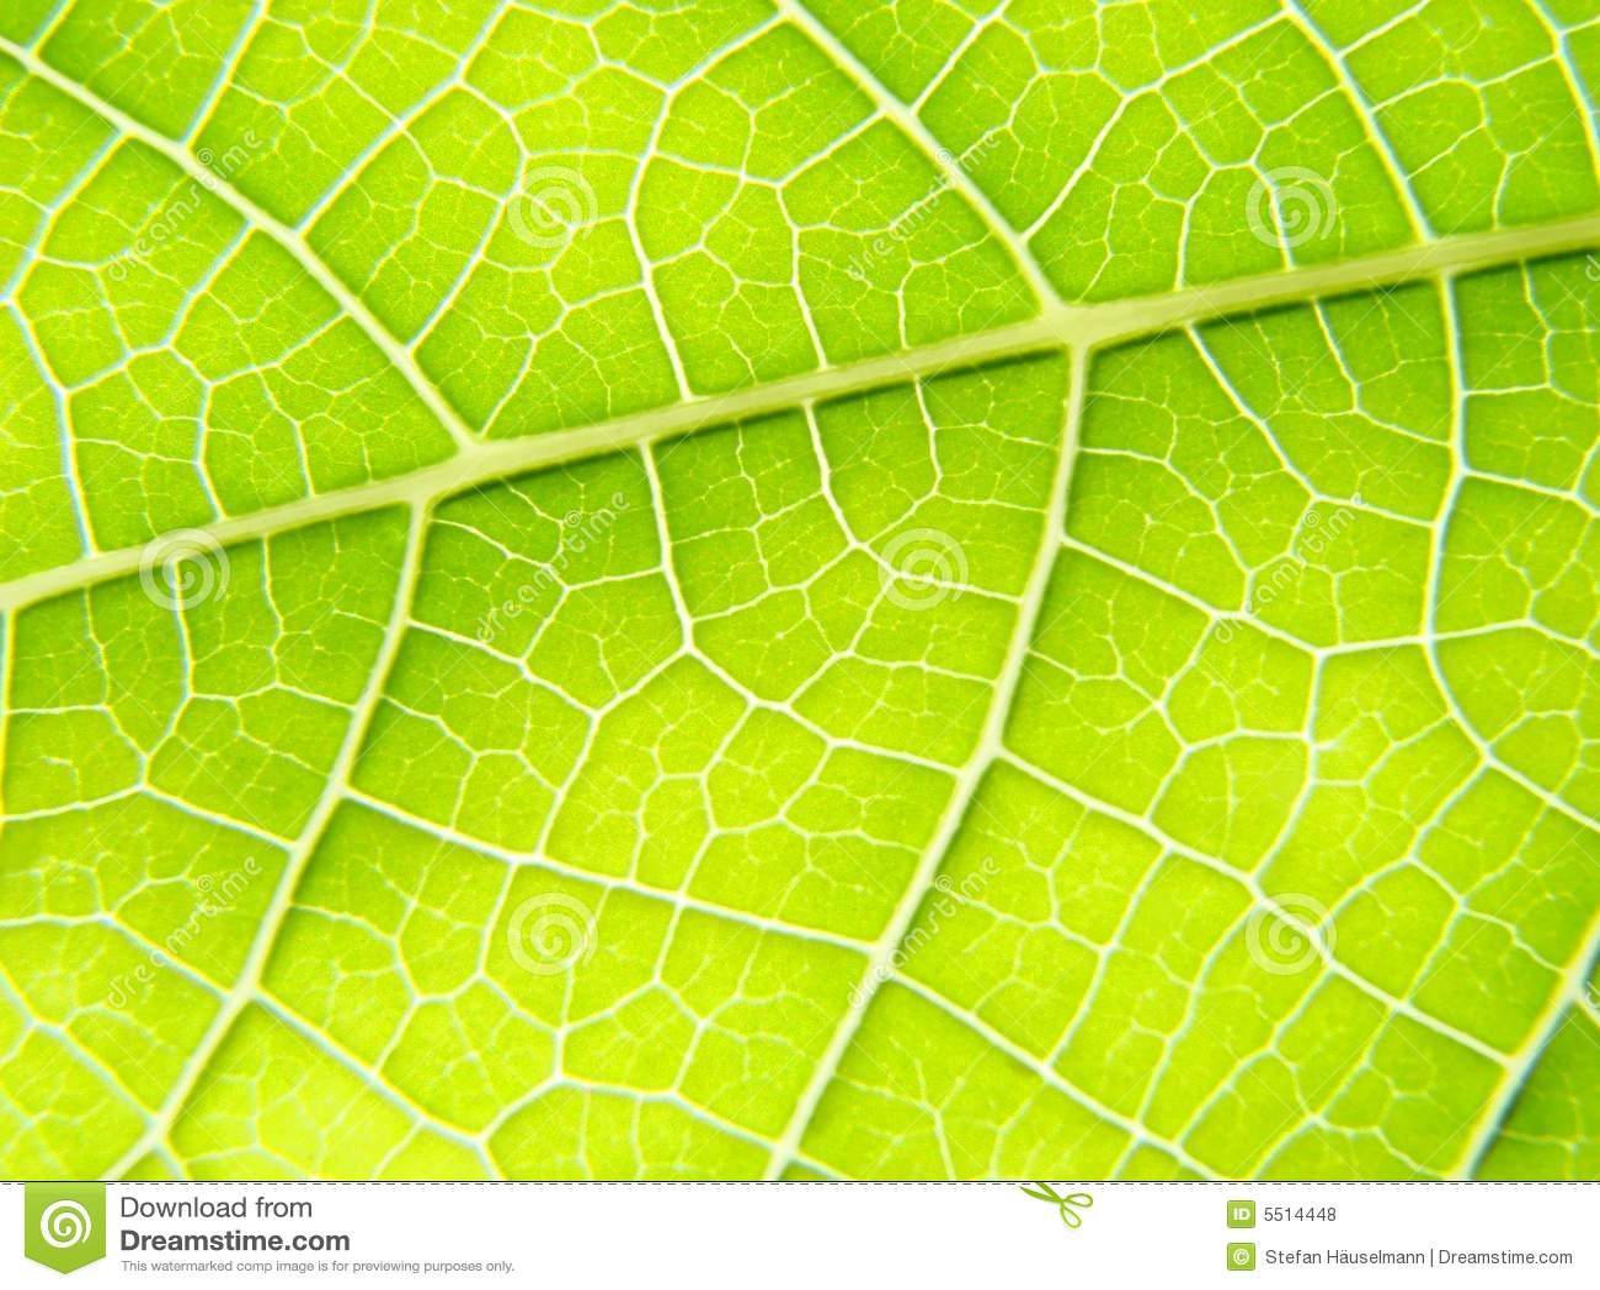 Green leaf macro vains bright